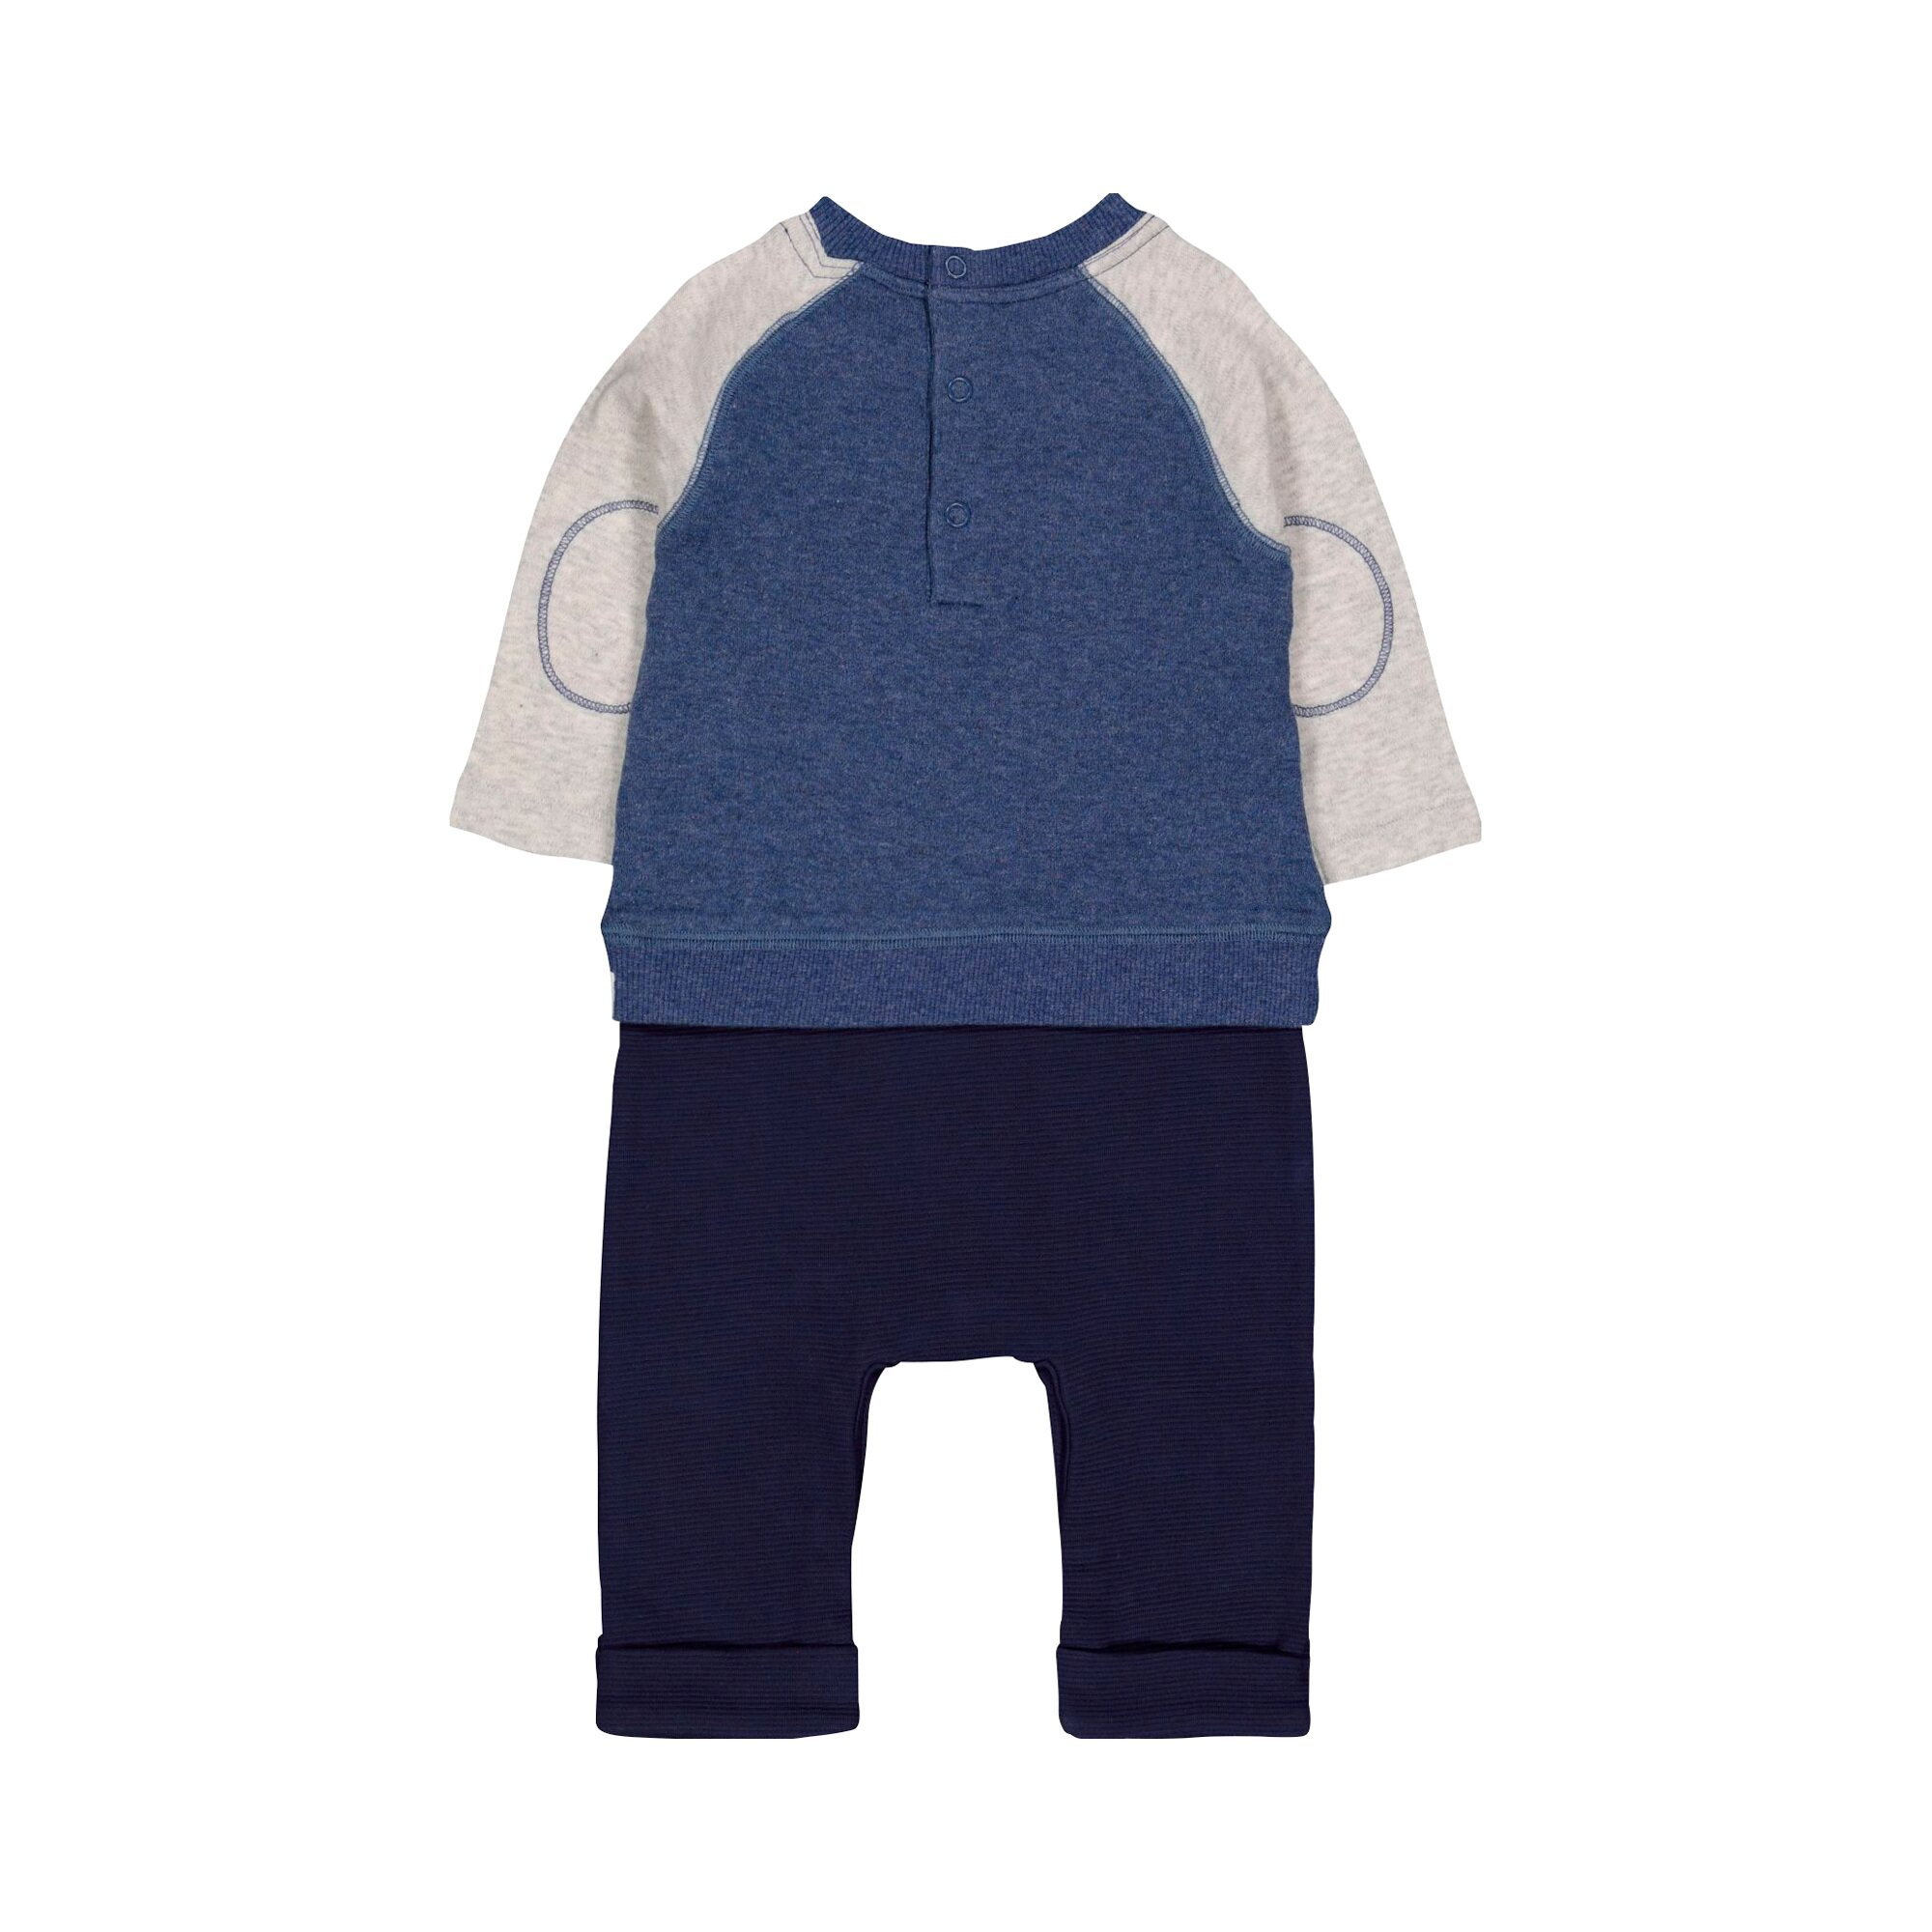 mothercare-2-tlg-set-sweatshirt-und-jogginghose-auto